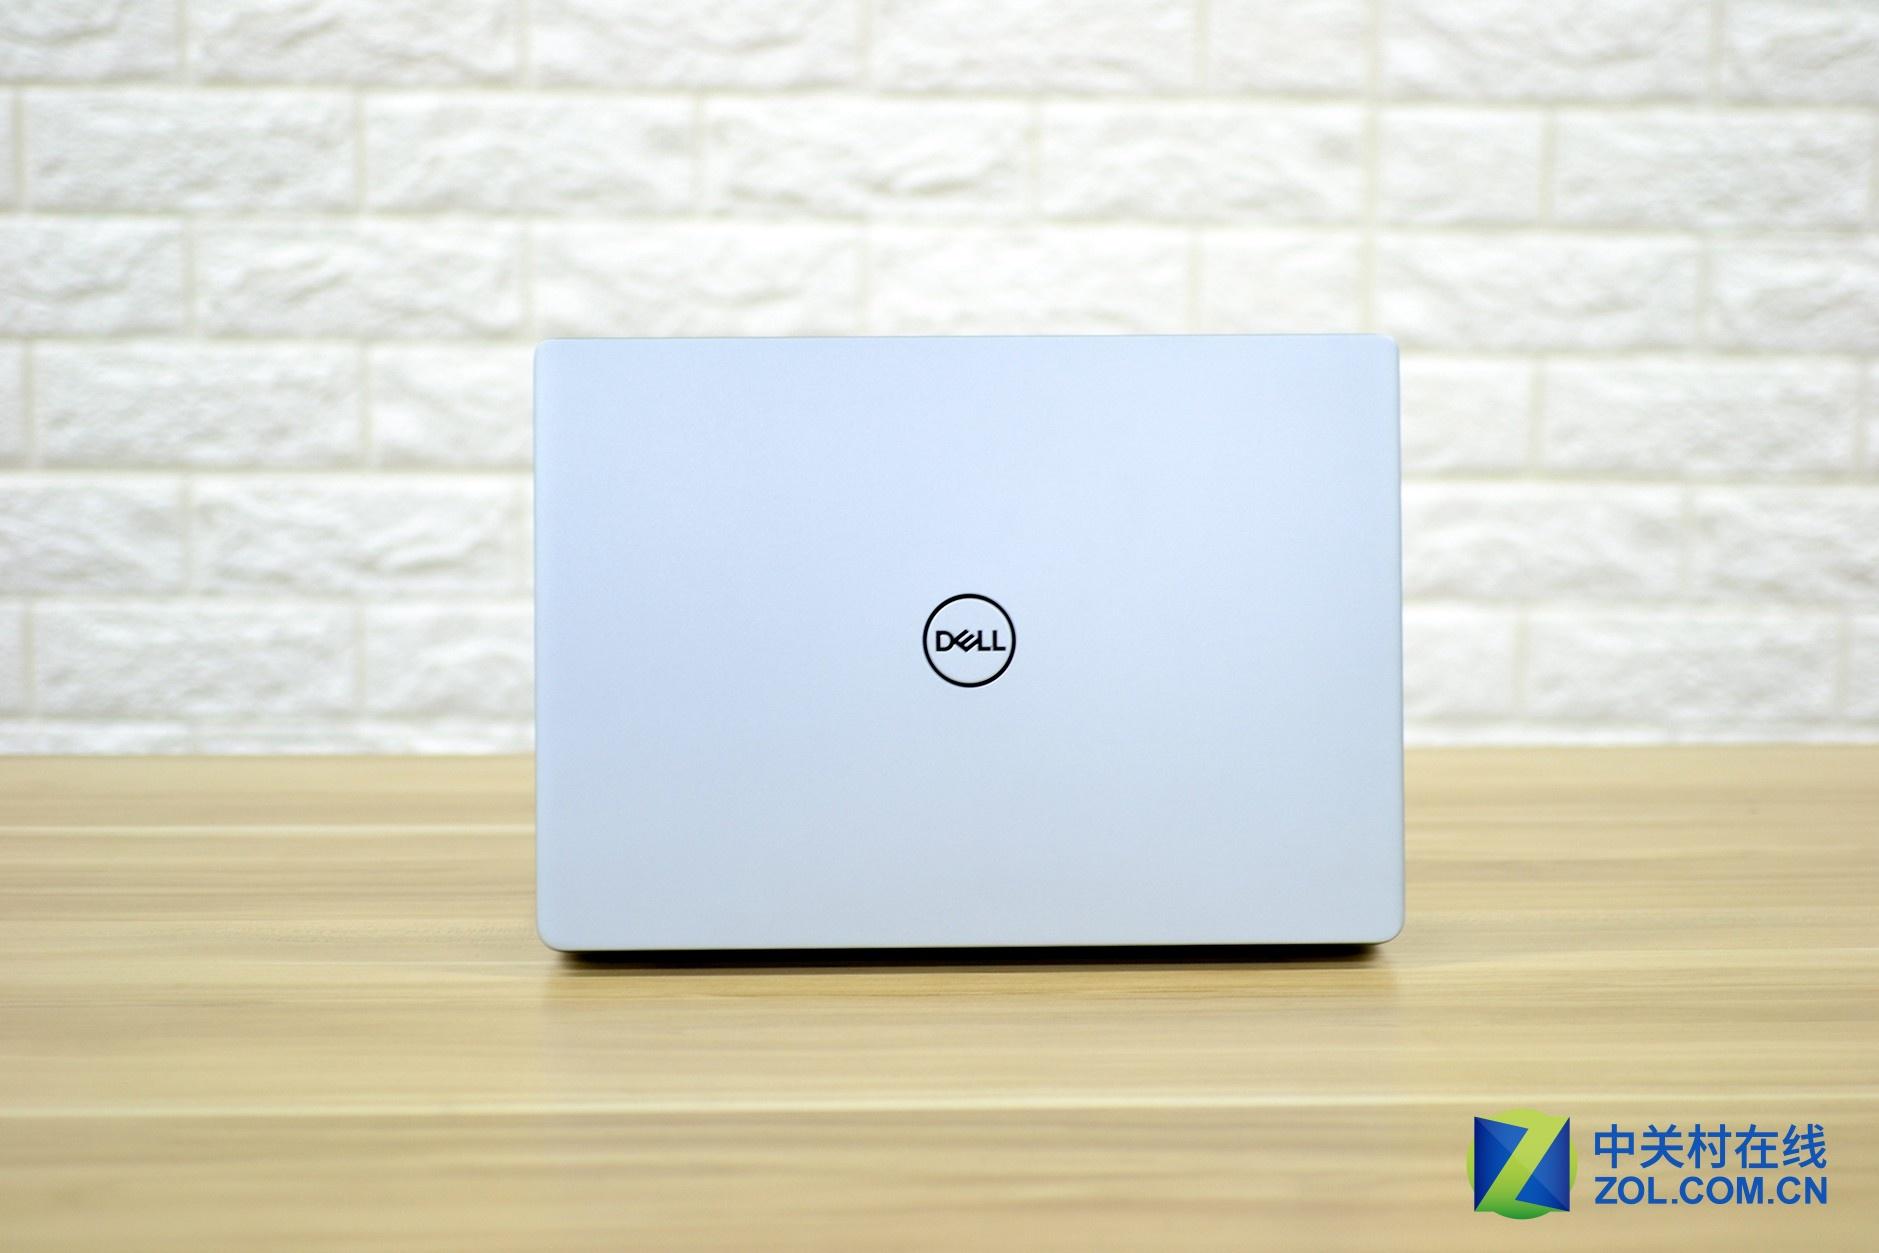 Dell Vostro 14 5481 Review - Laptopmain com